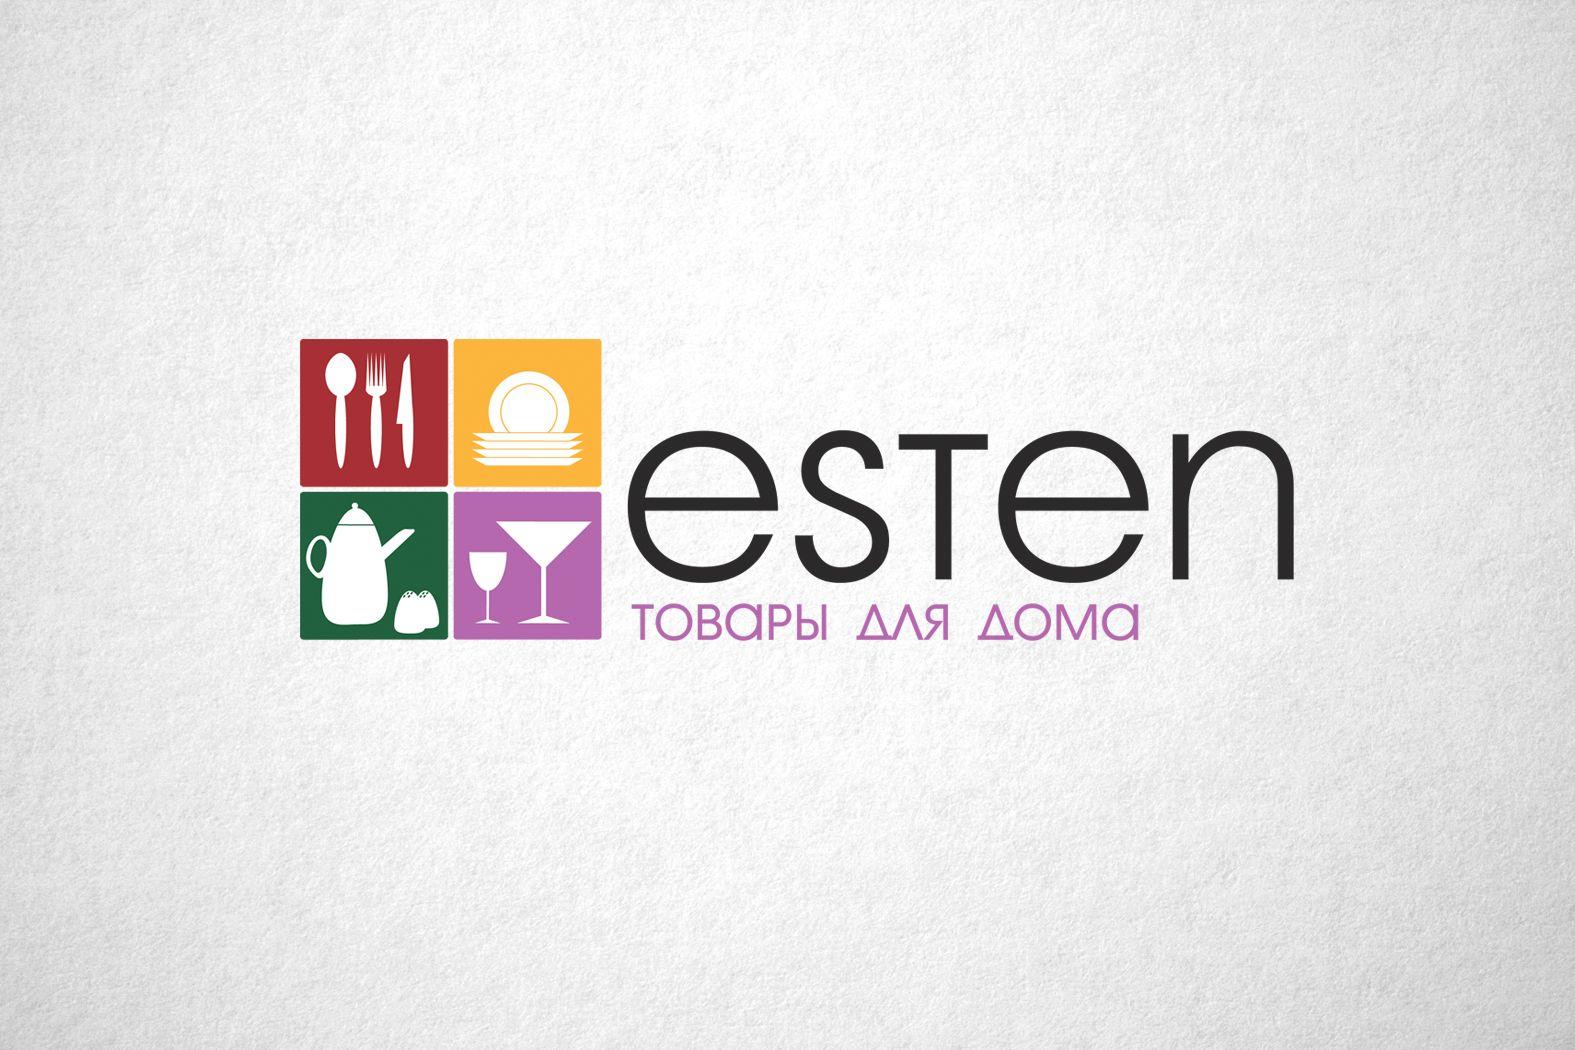 Создание логотипа - дизайнер funkielevis